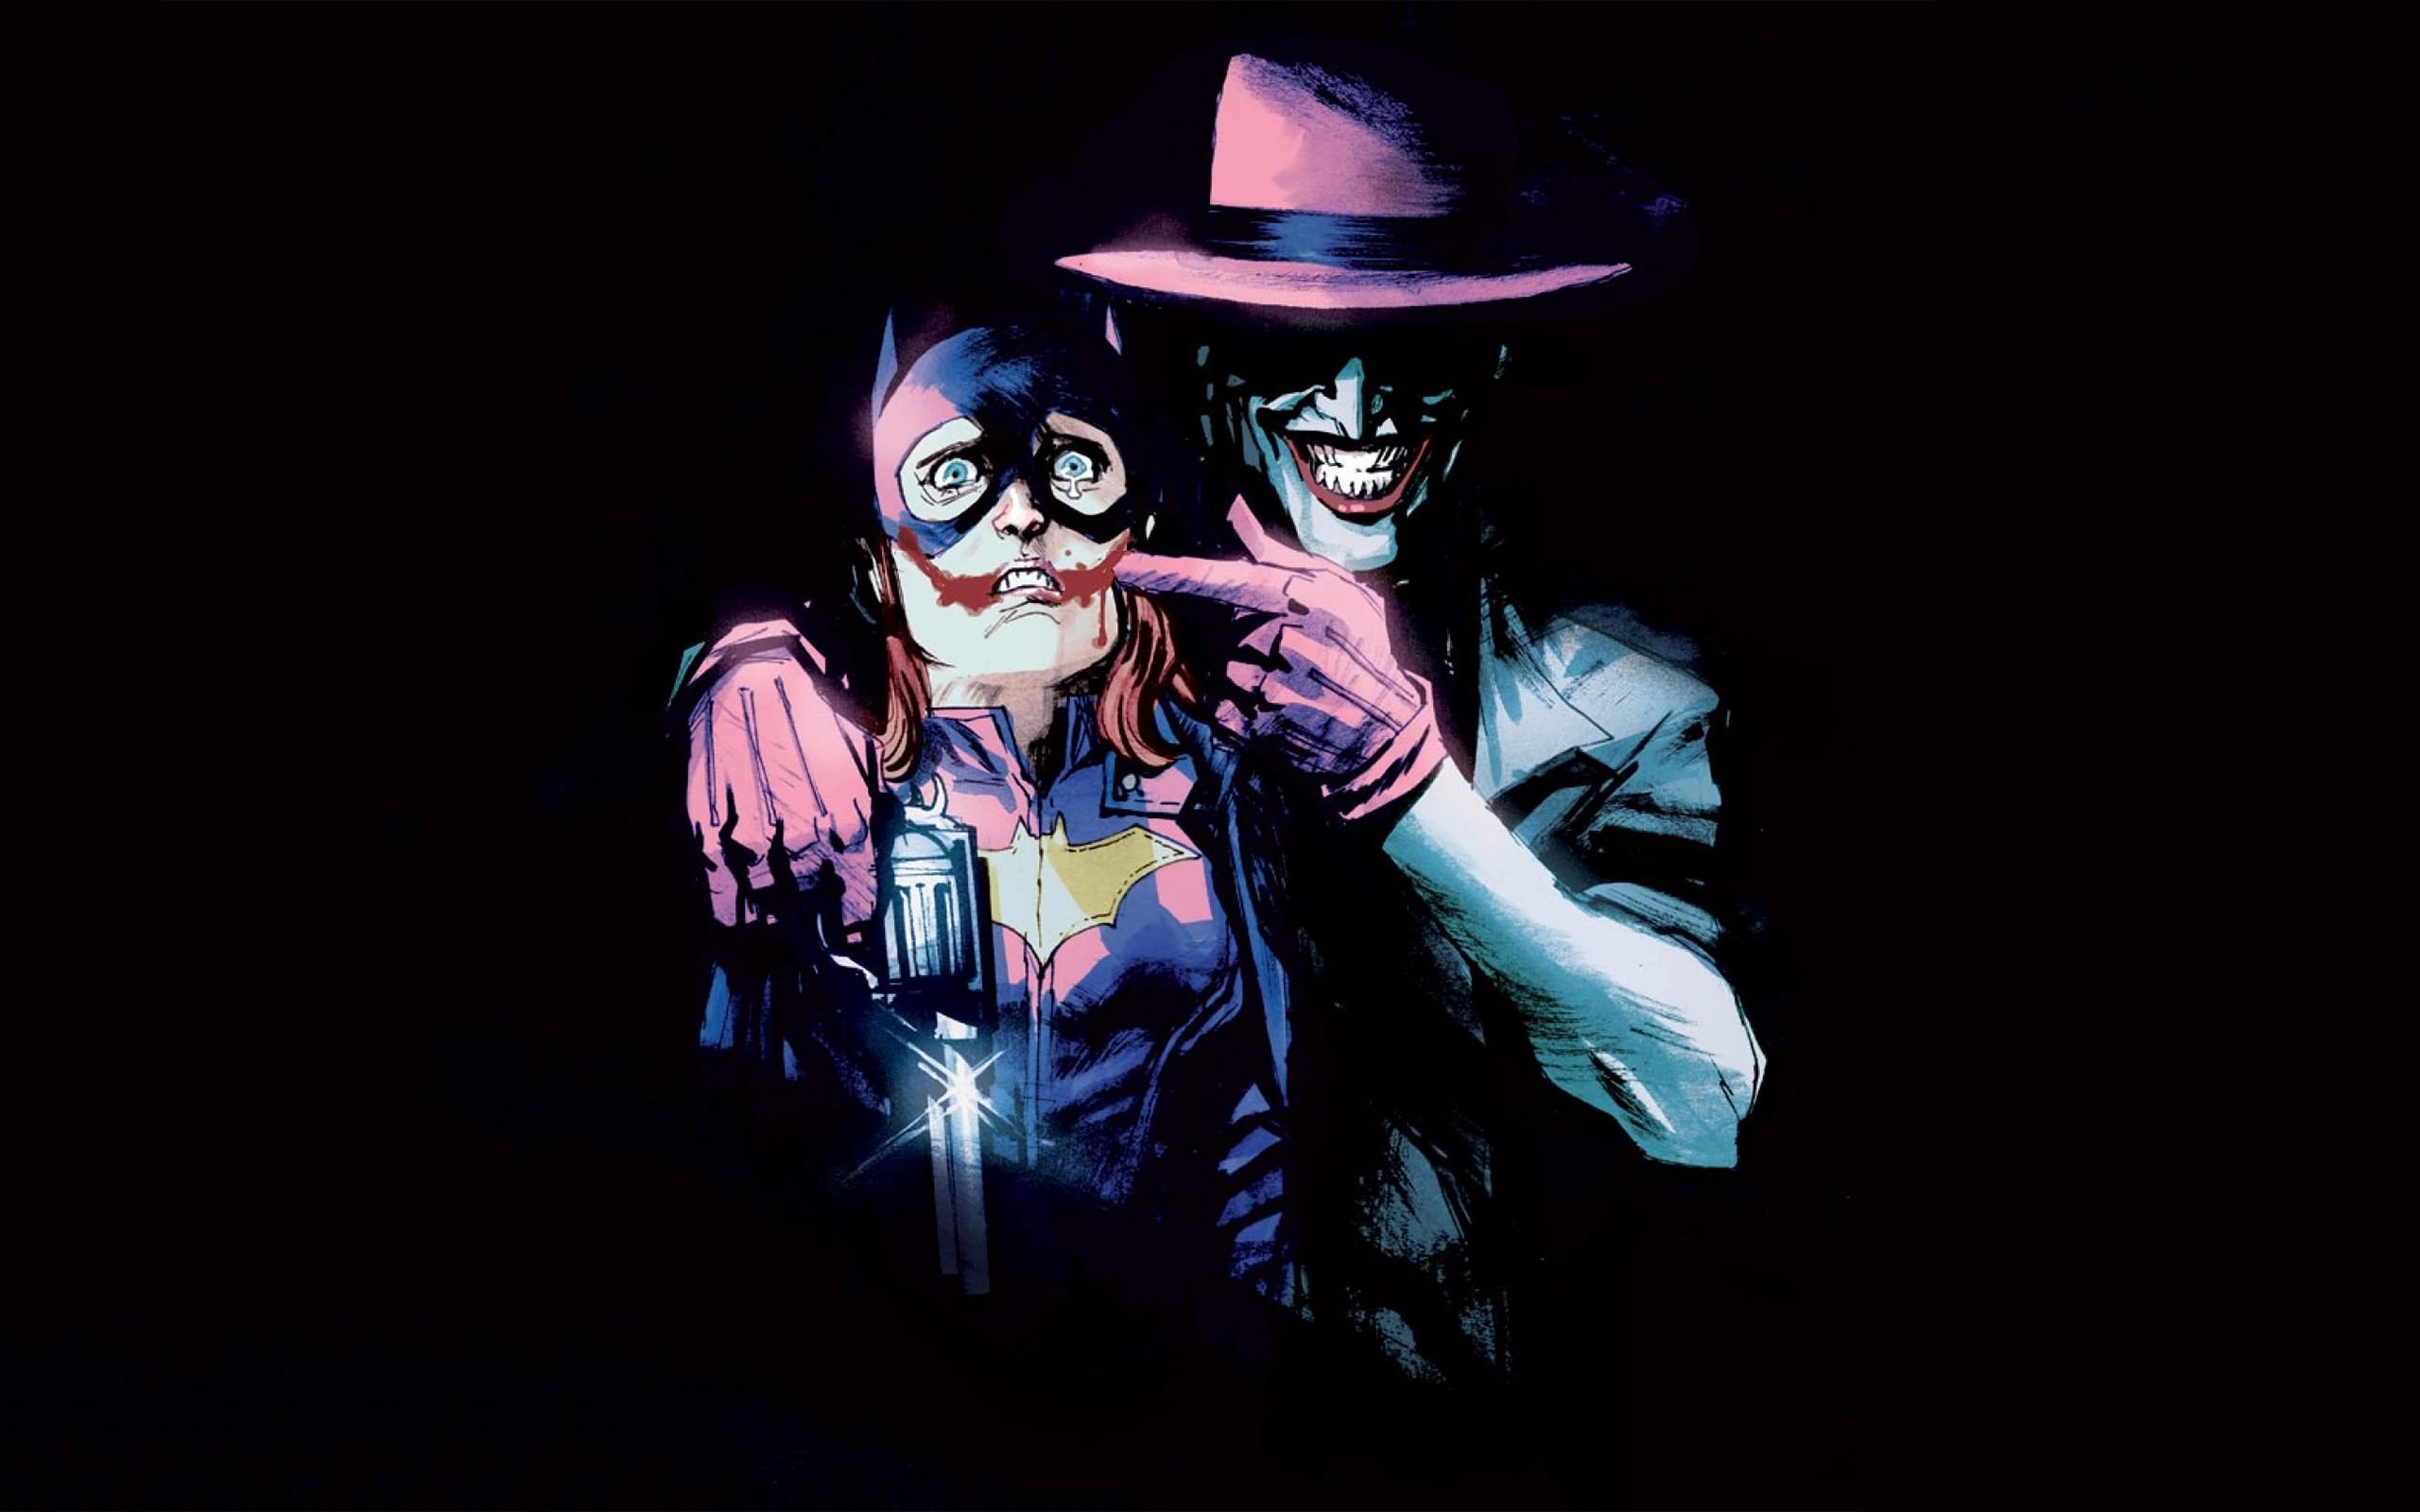 Joker, Batgirl, DC Comics